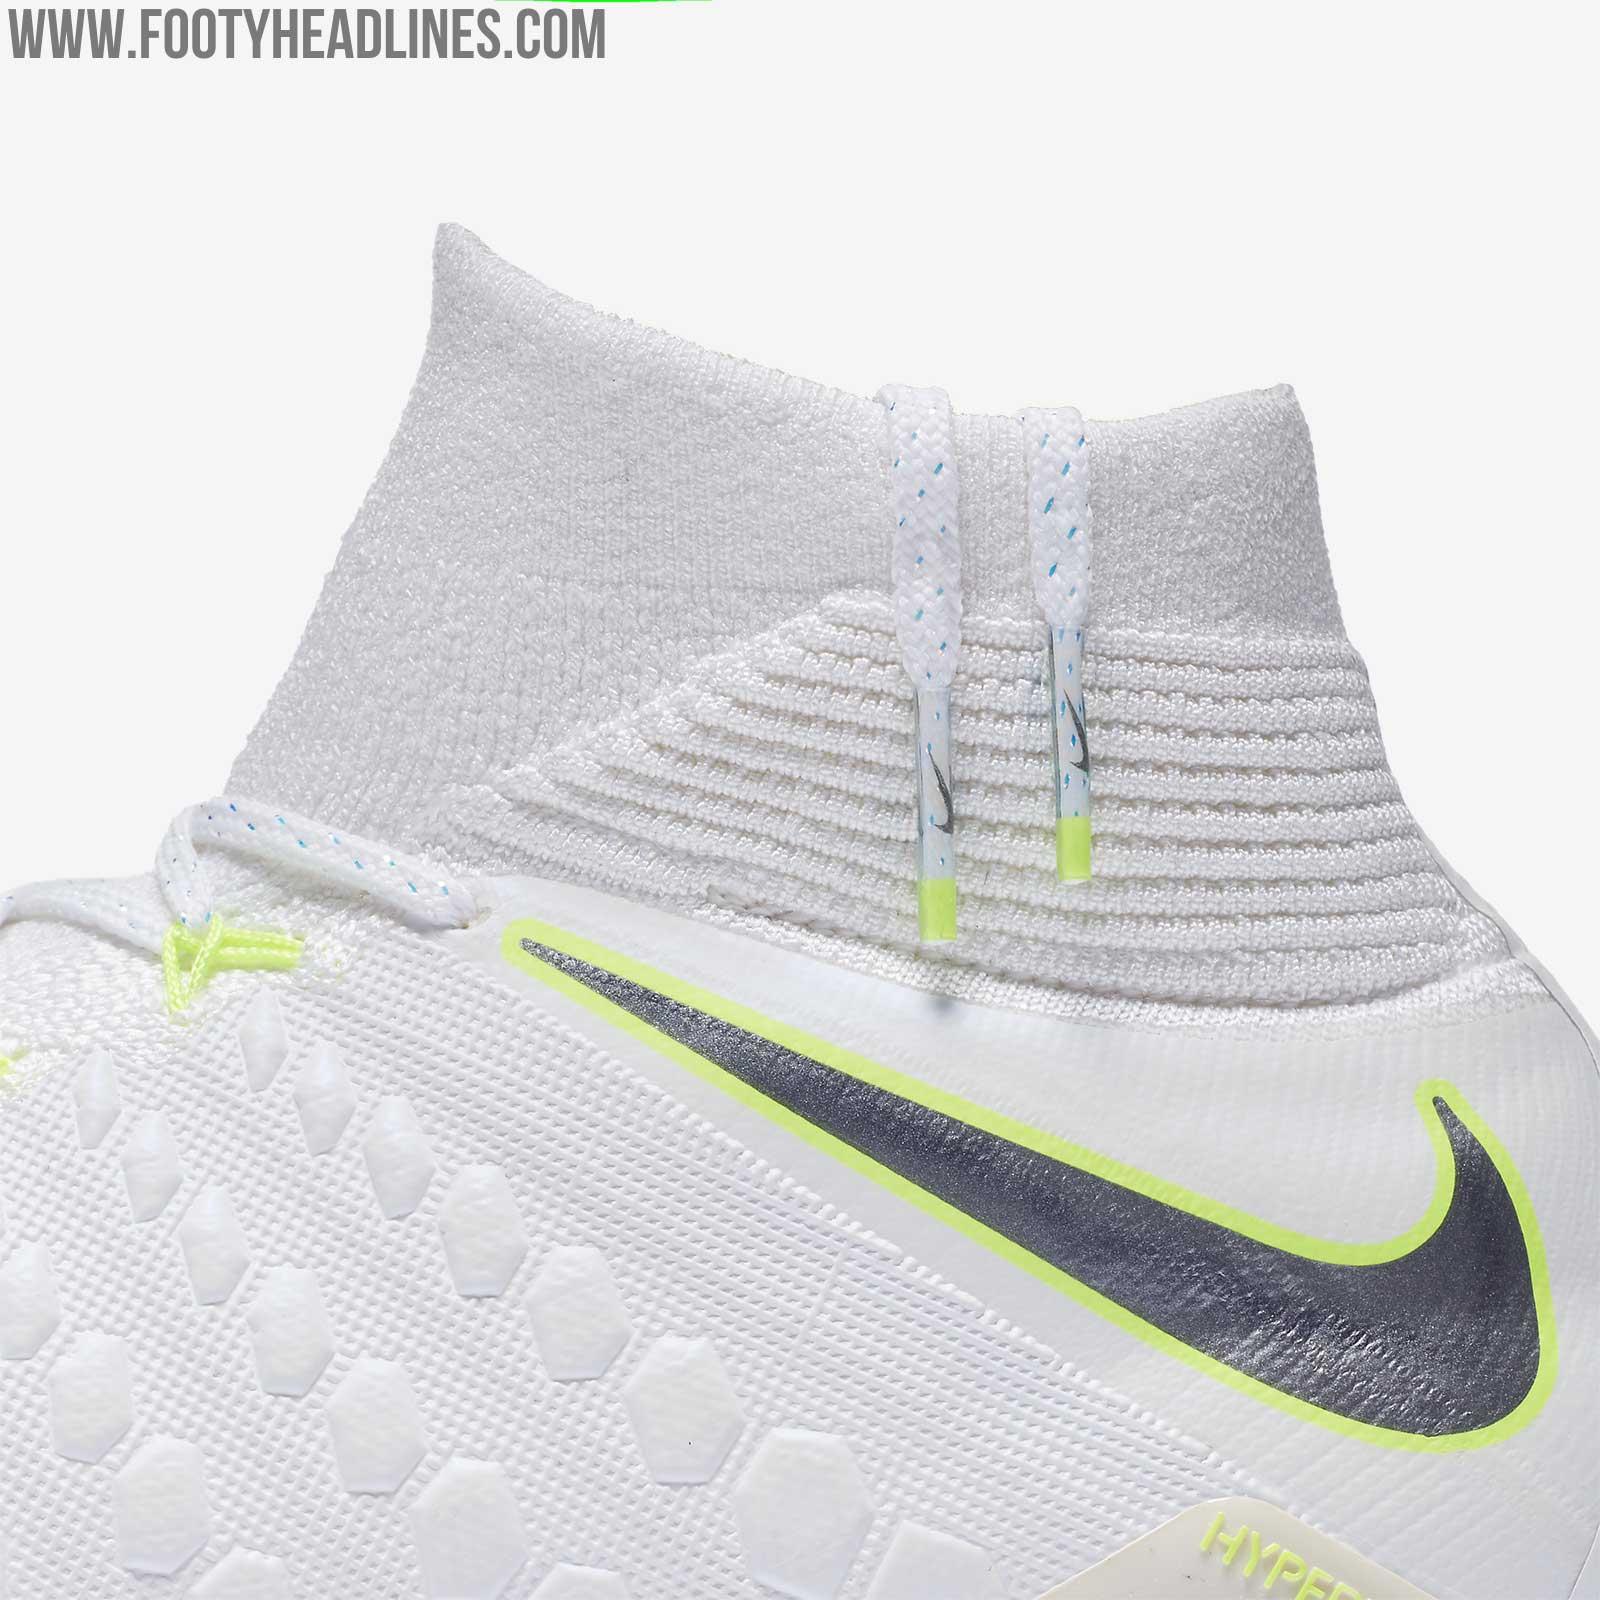 fc31c5c46200 Nike Hypervenom Phantom III DF - White   Metallic Silver   Volt